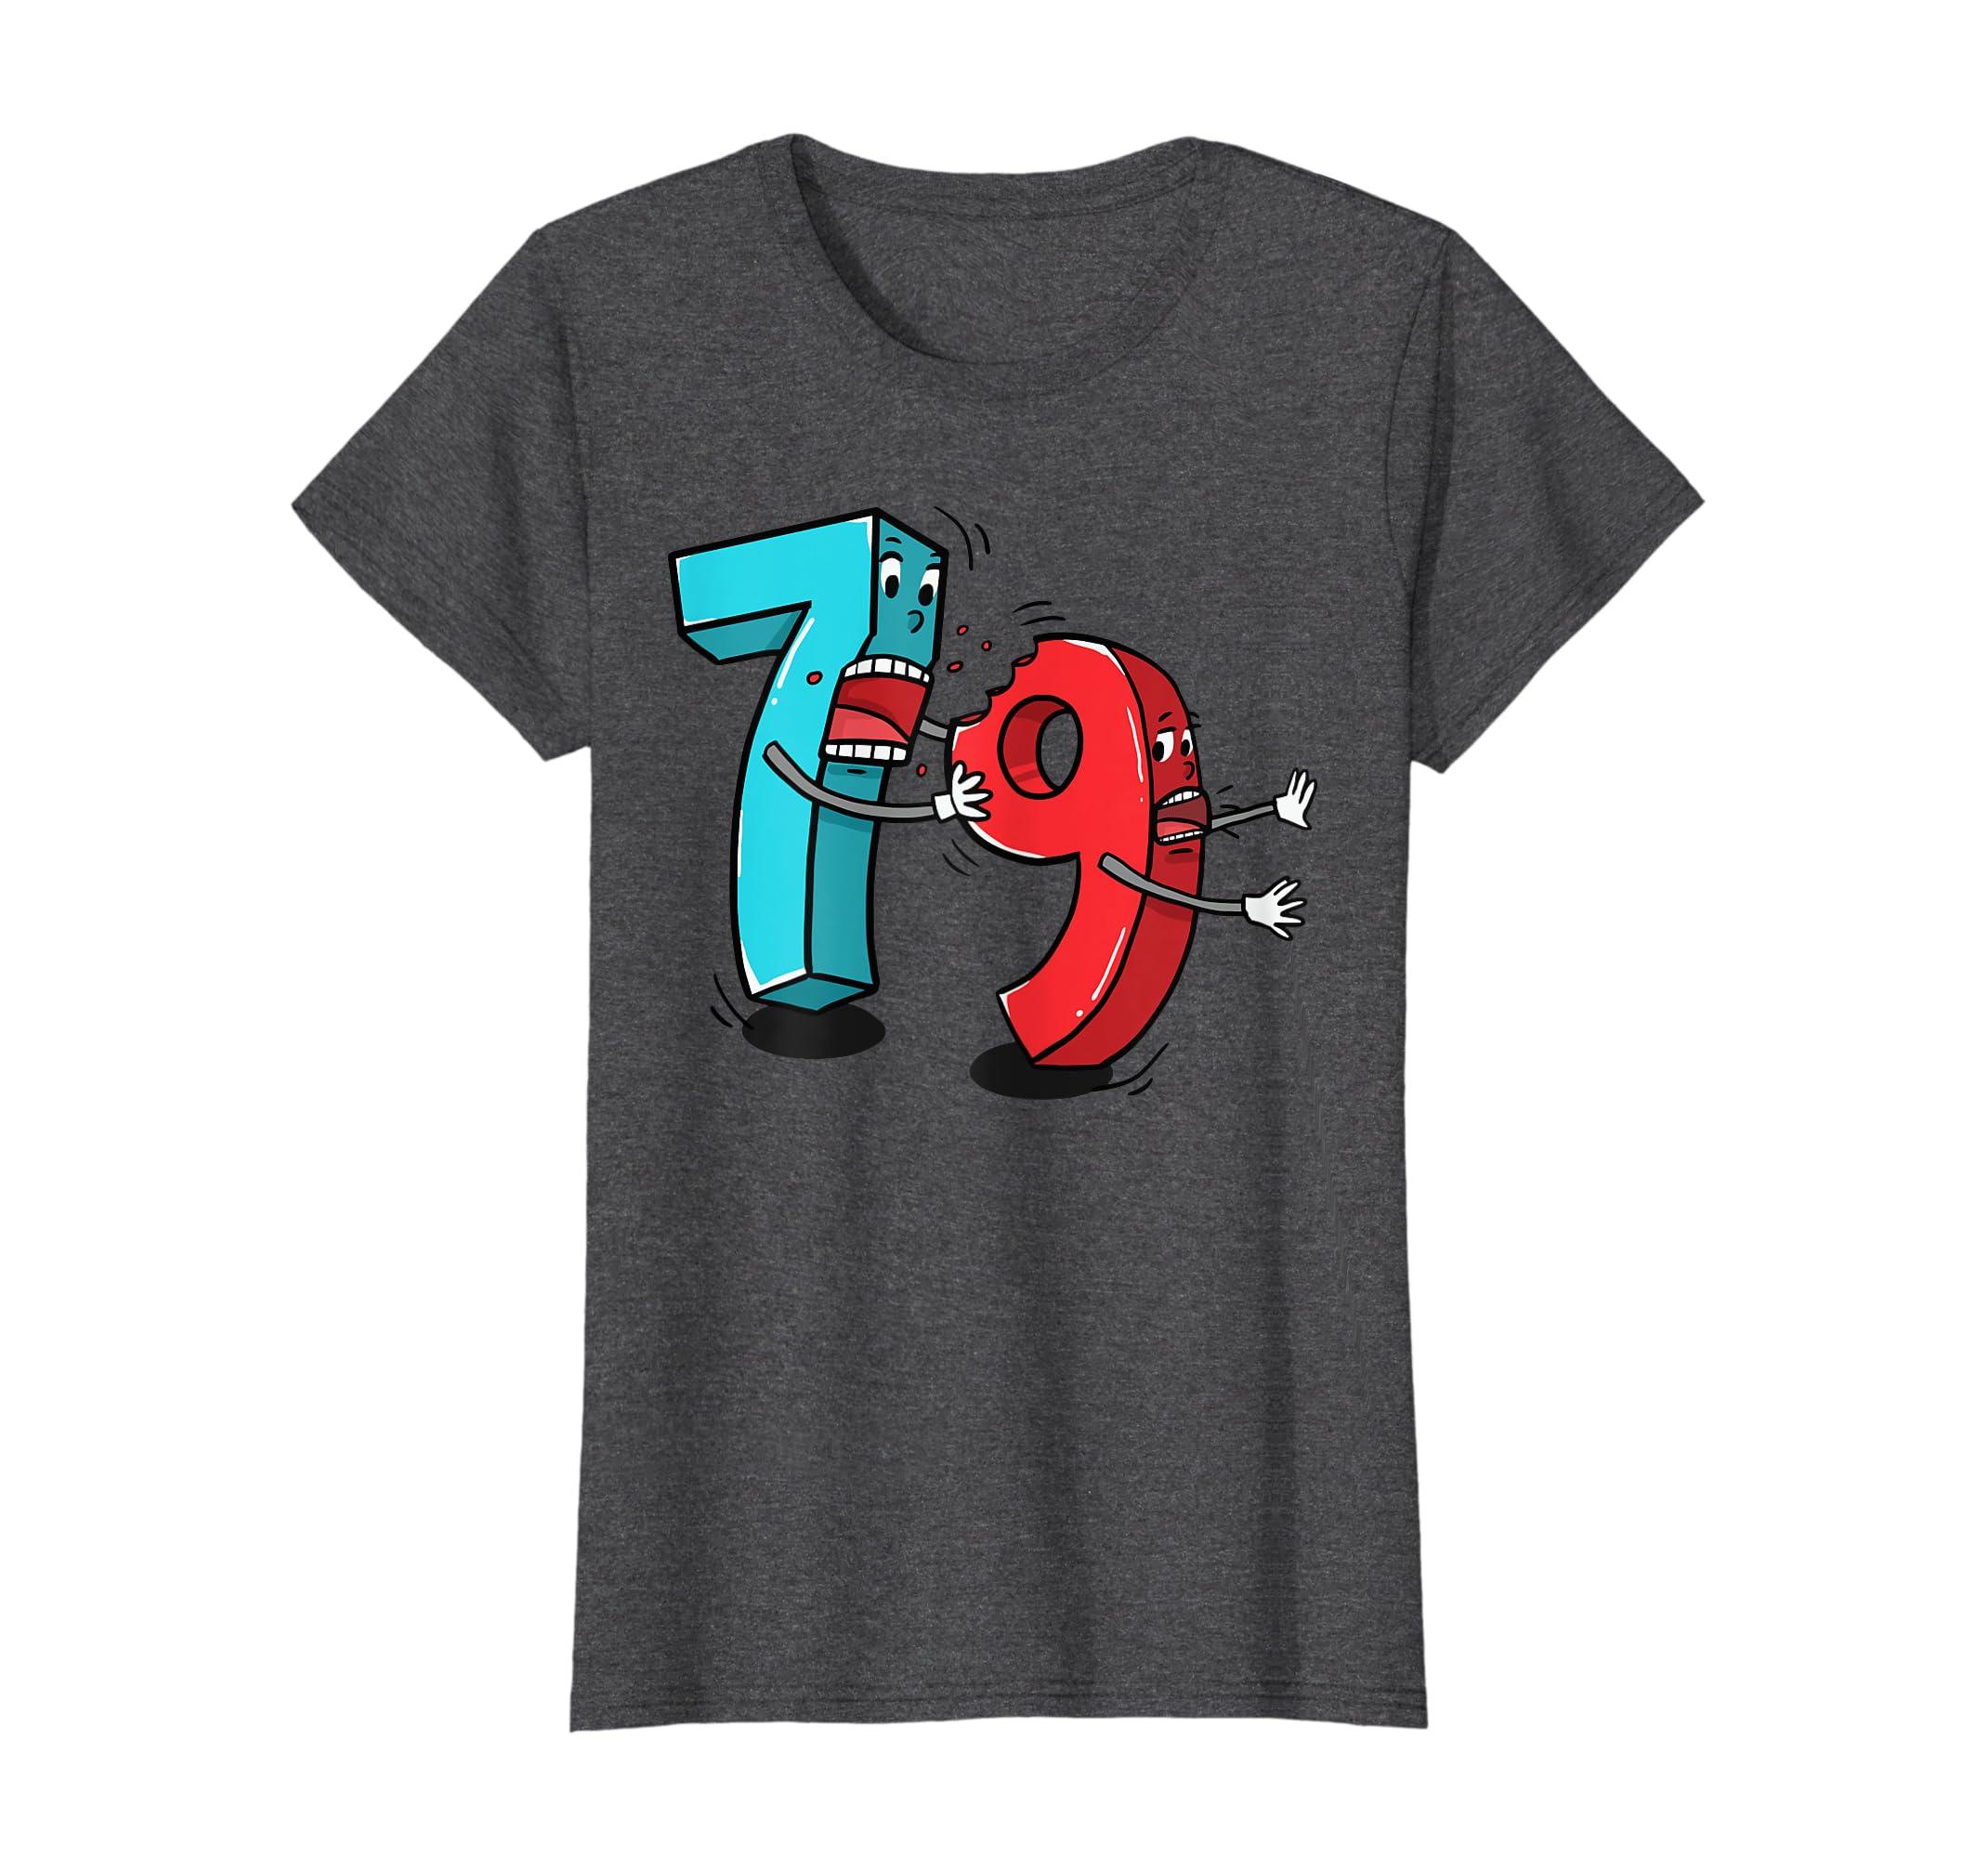 b3a3e98c40 Amazon.com: 7 ate (8) 9 Funny Math T Shirt: Clothing